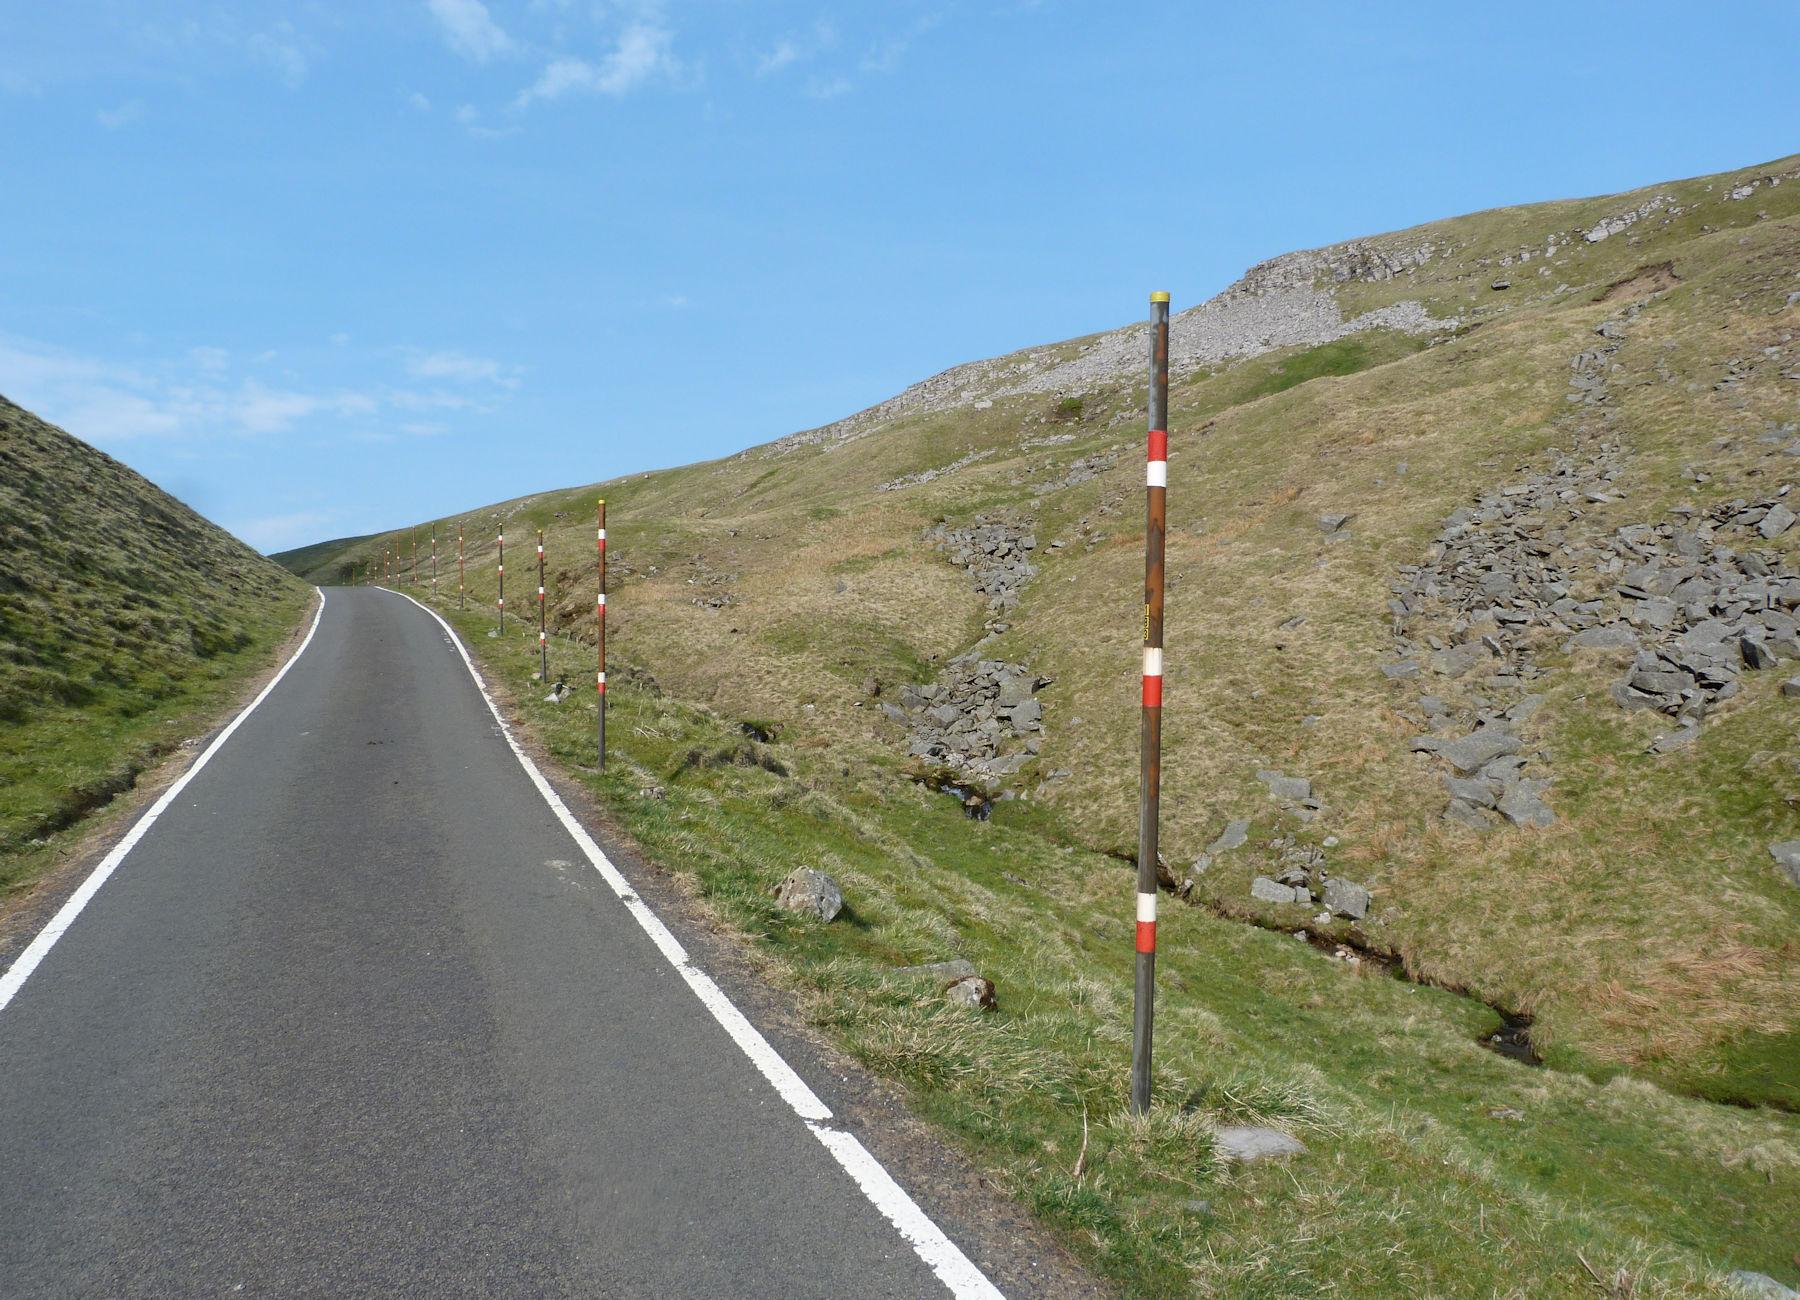 Nearing Great Dun Fell